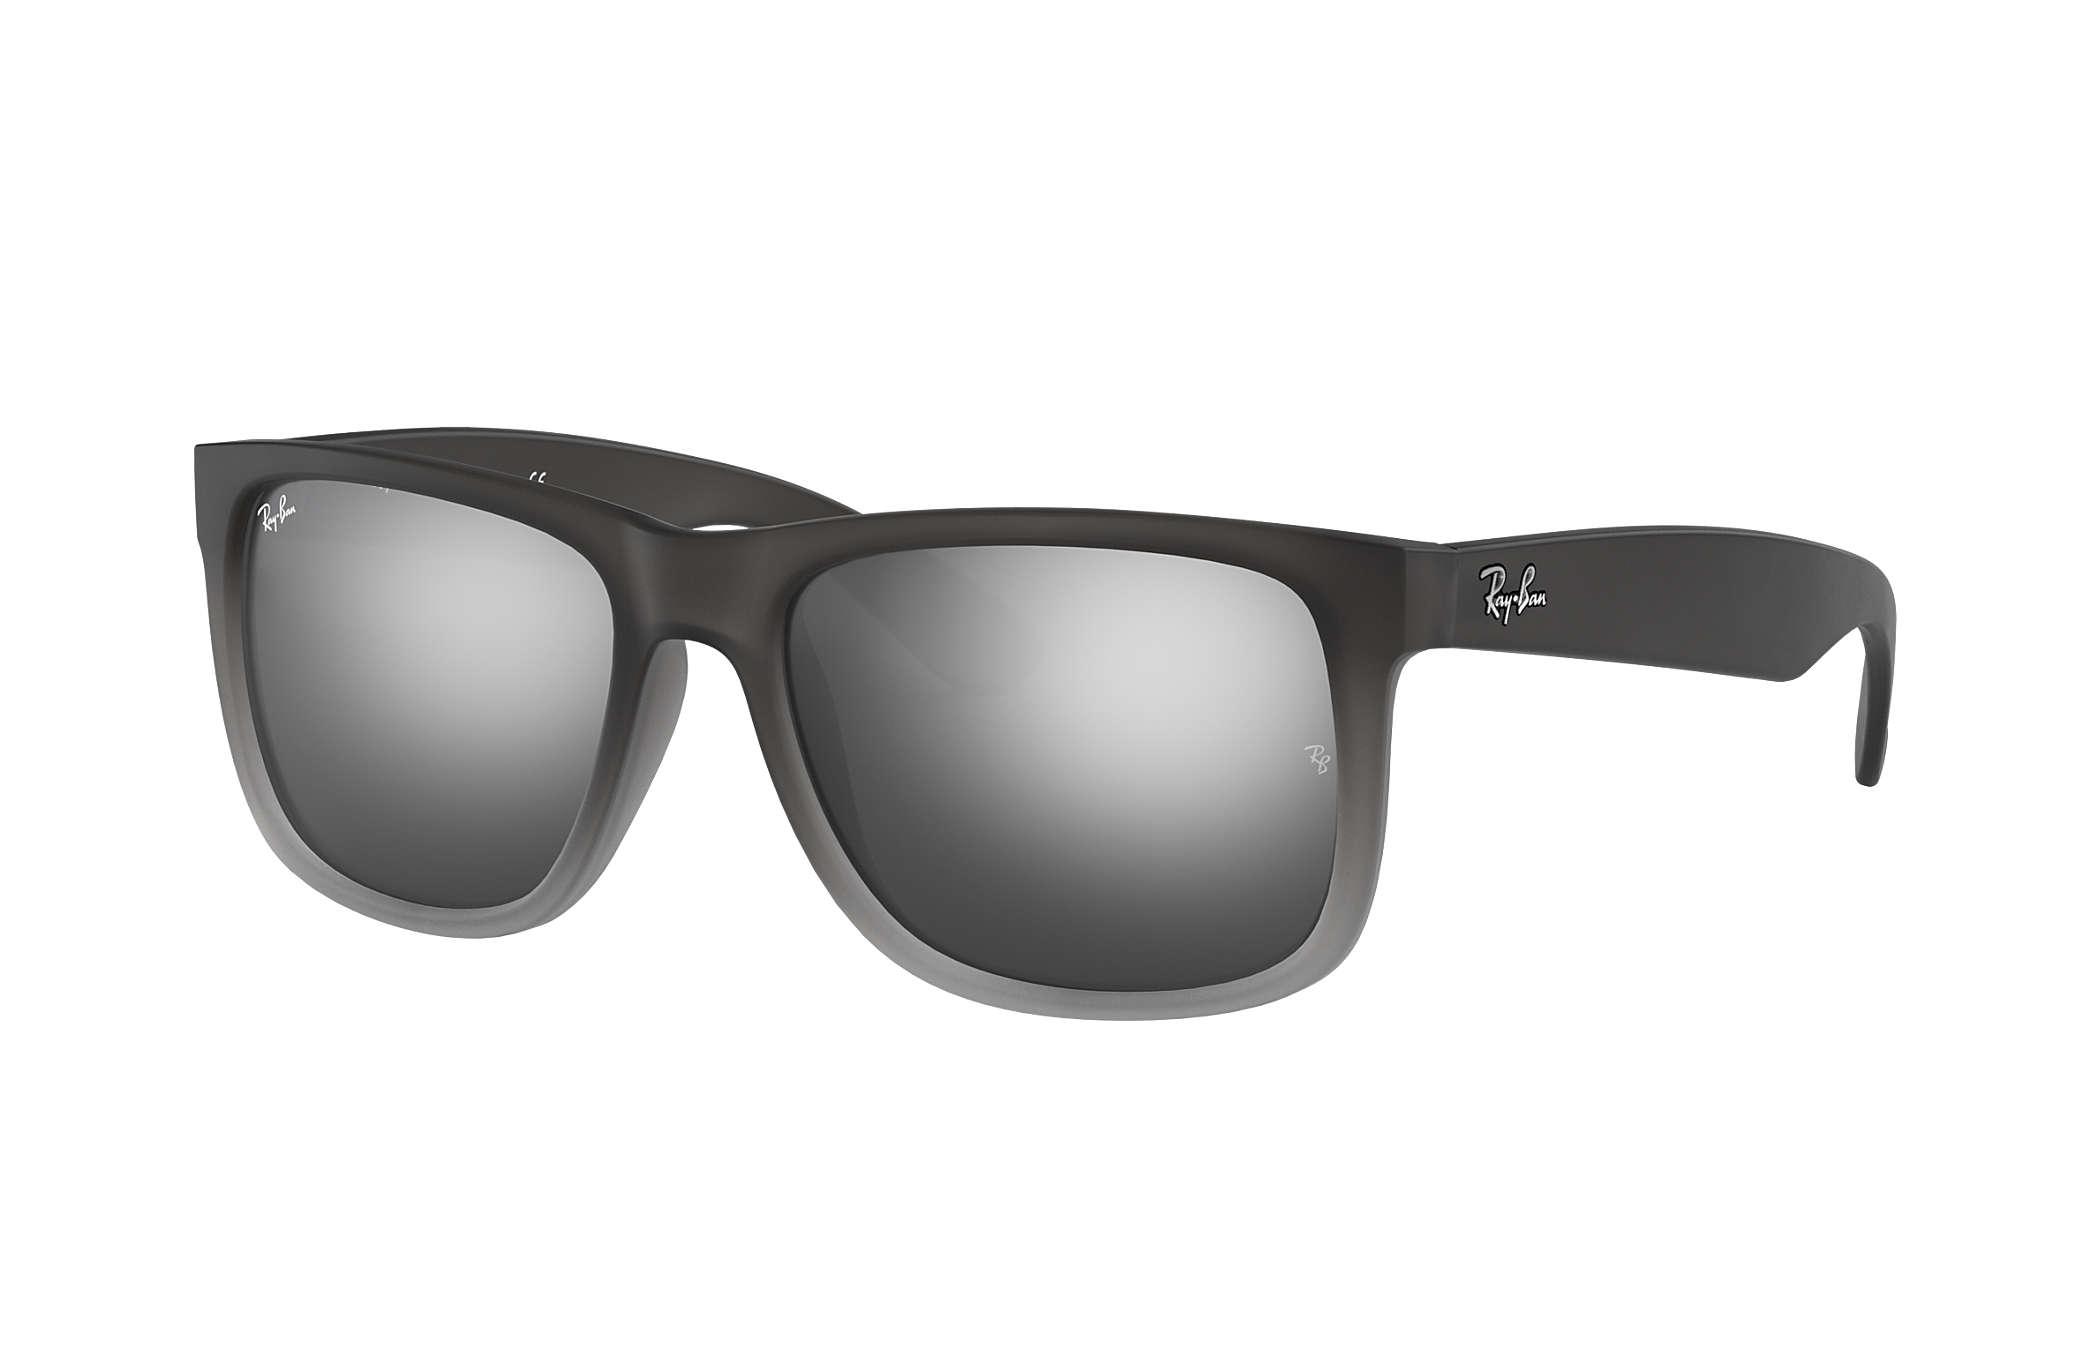 Óculos de sol Justin  a coleção   Ray-Ban® Brasil 39943a8427